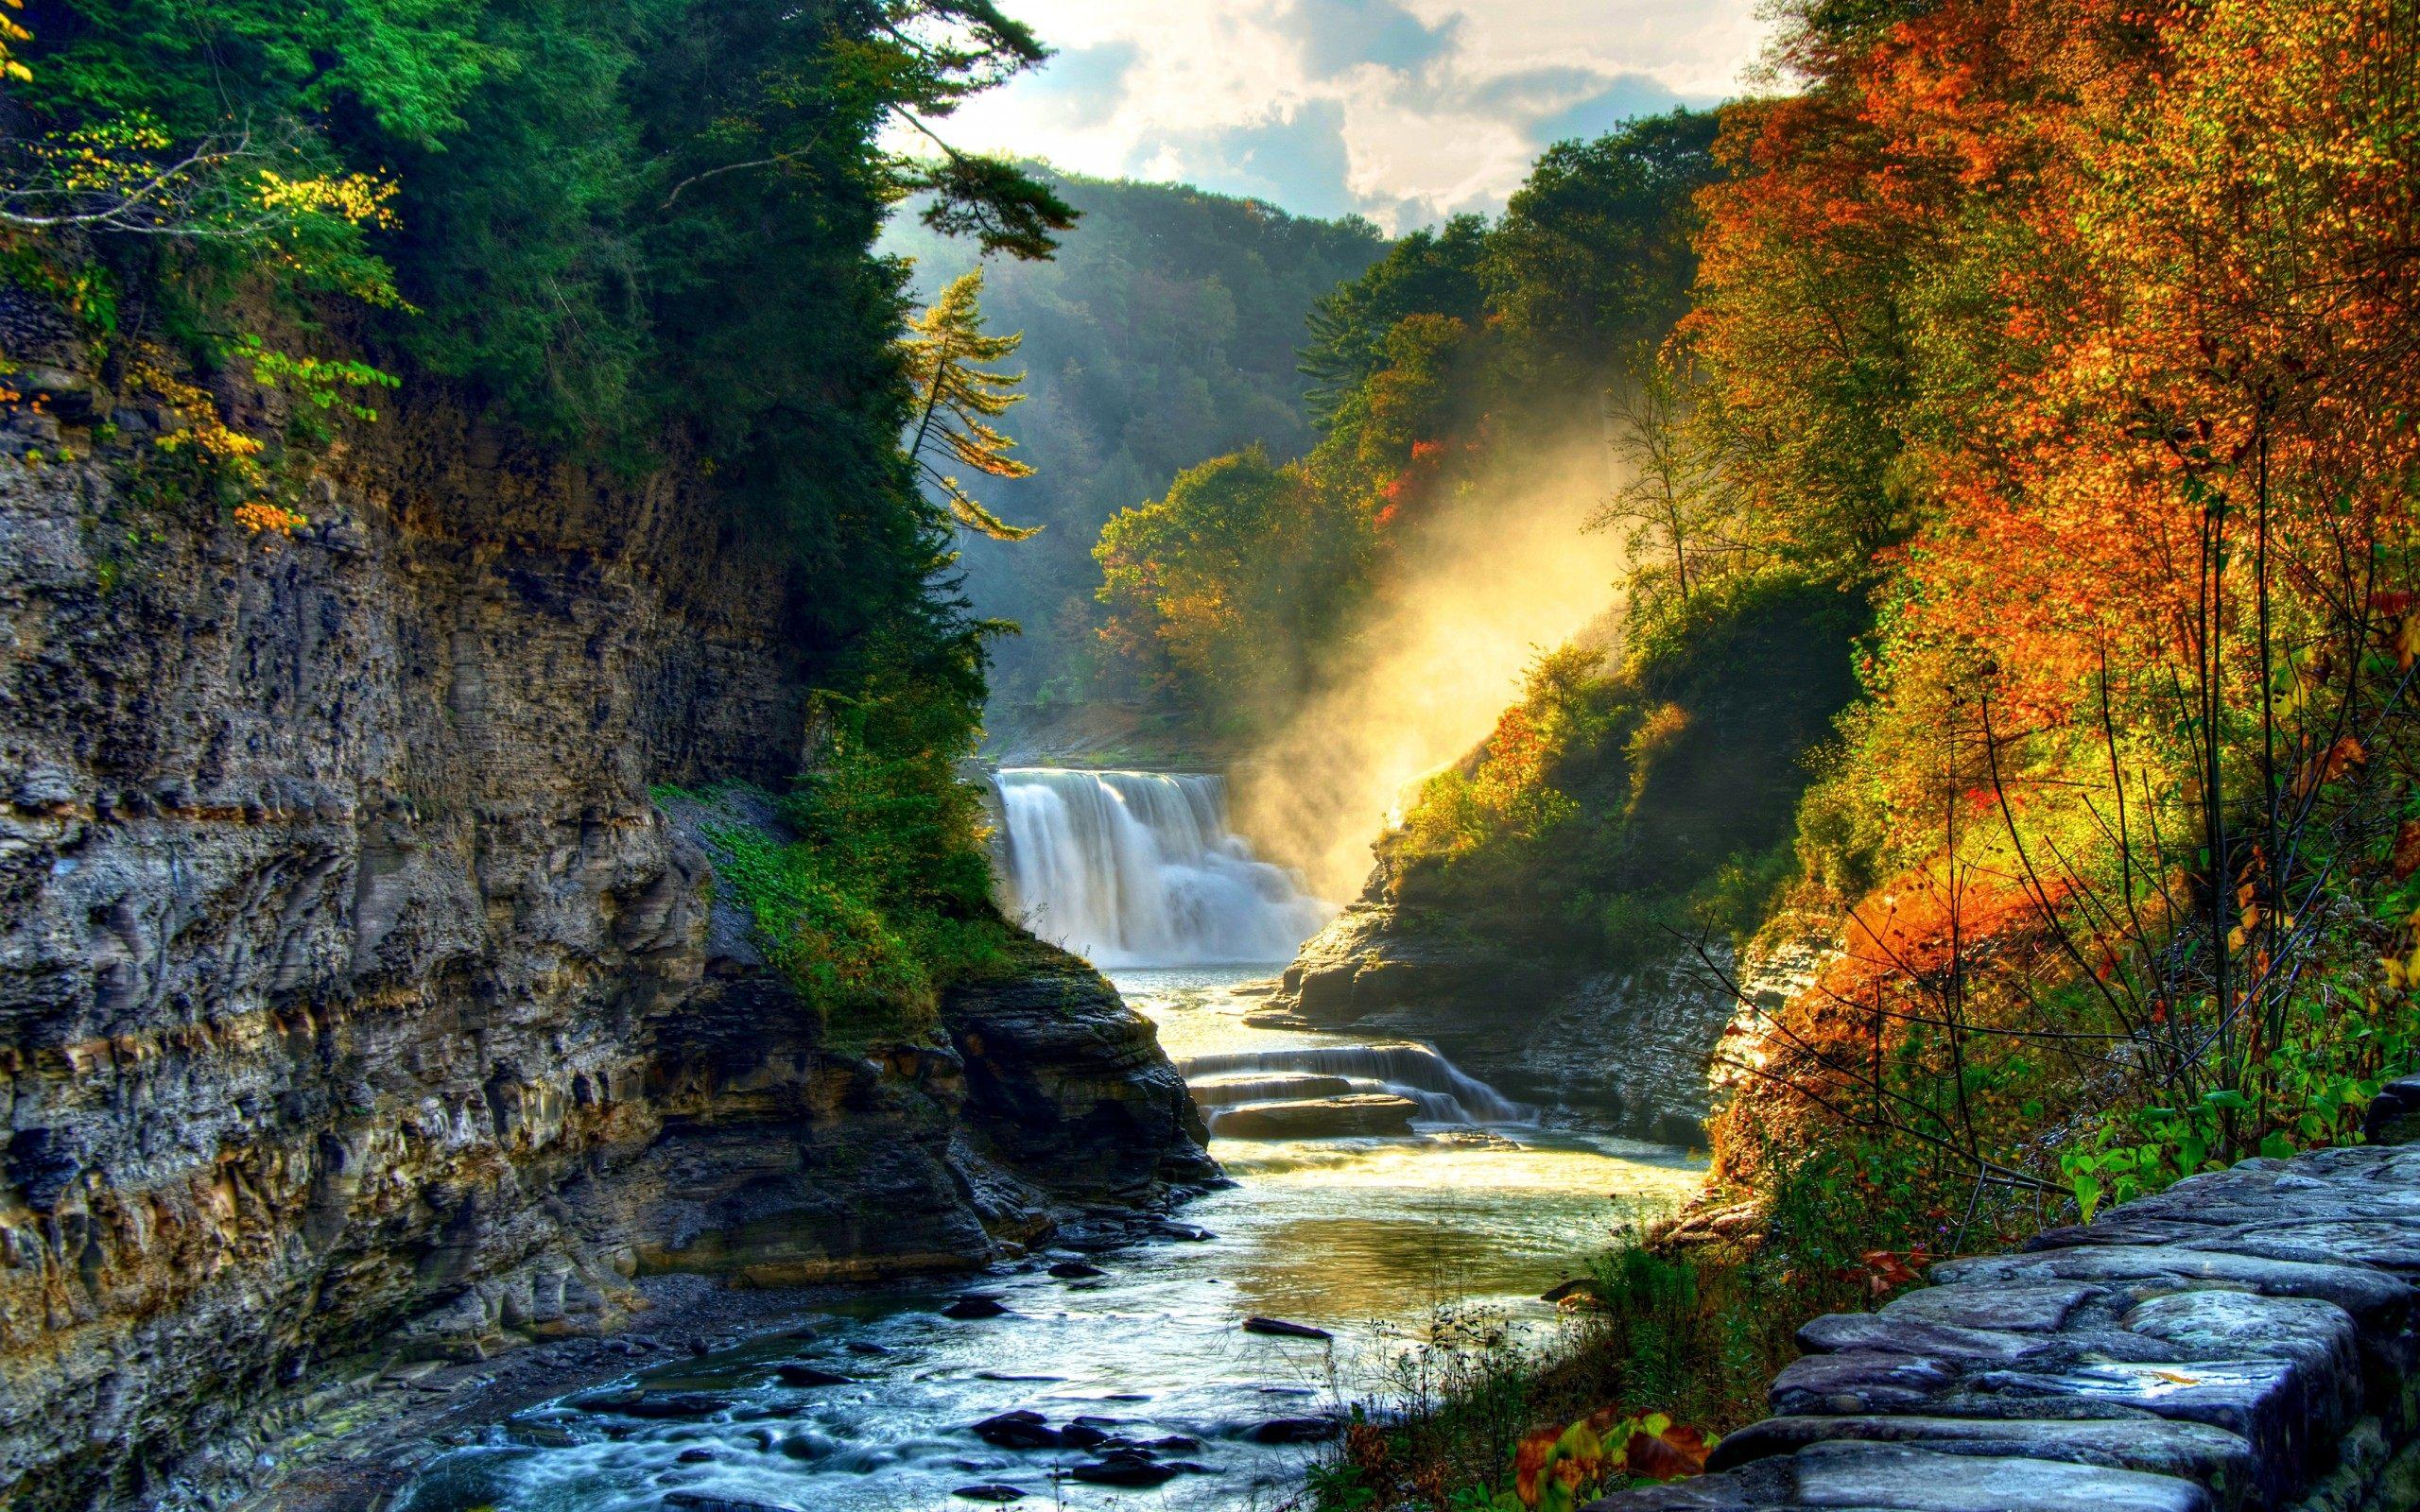 Waterfall Backgrounds Free